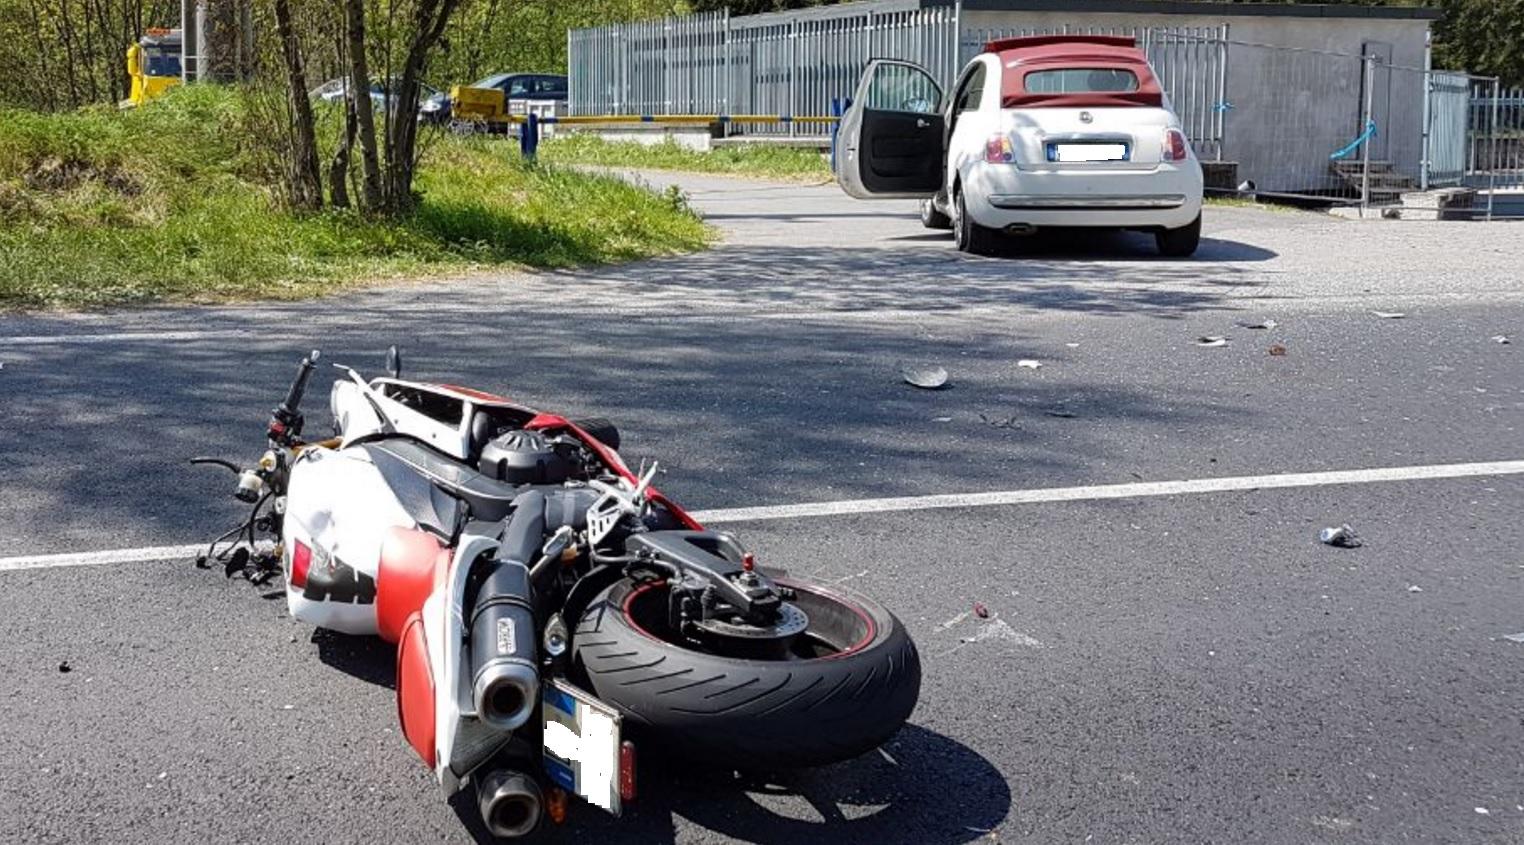 Tragico incidente a Taceno: morto un motociclista